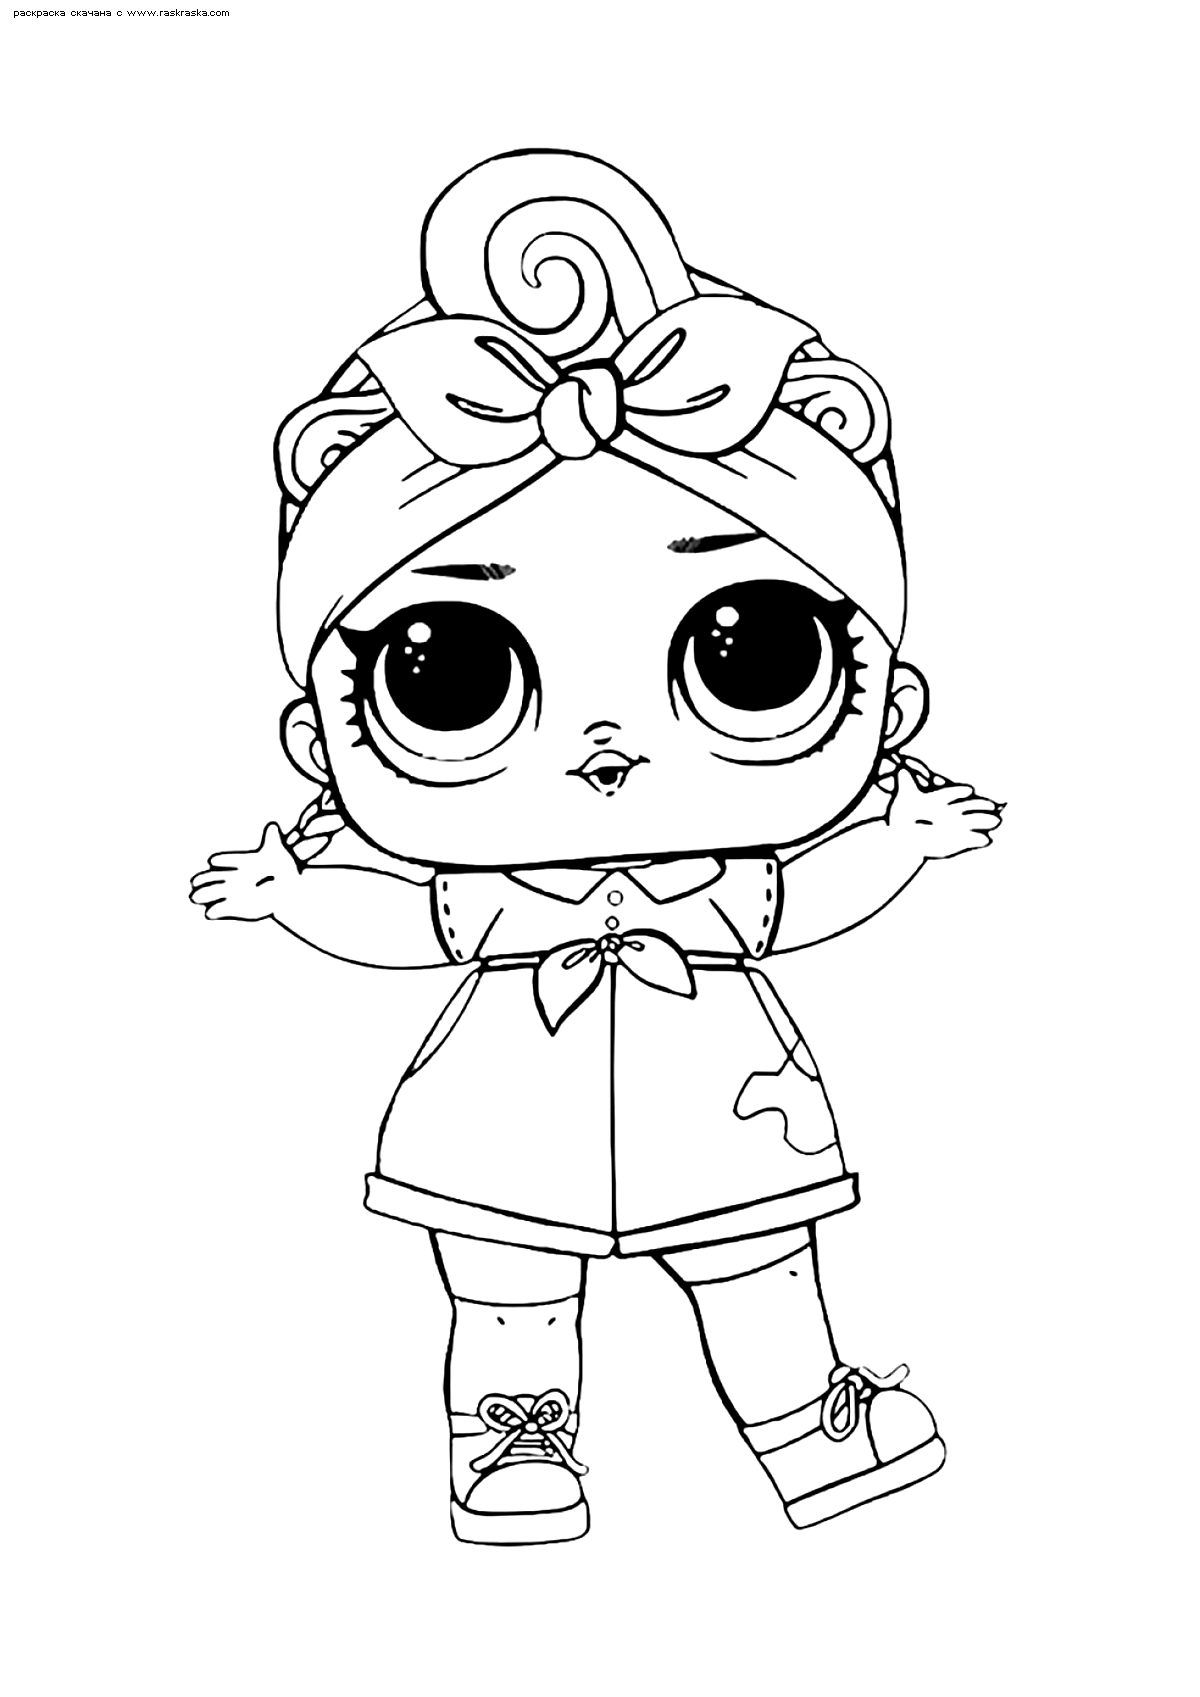 Раскраска ЛОЛ Can Do Baby конфетти поп( Работяжка). Раскраска лол